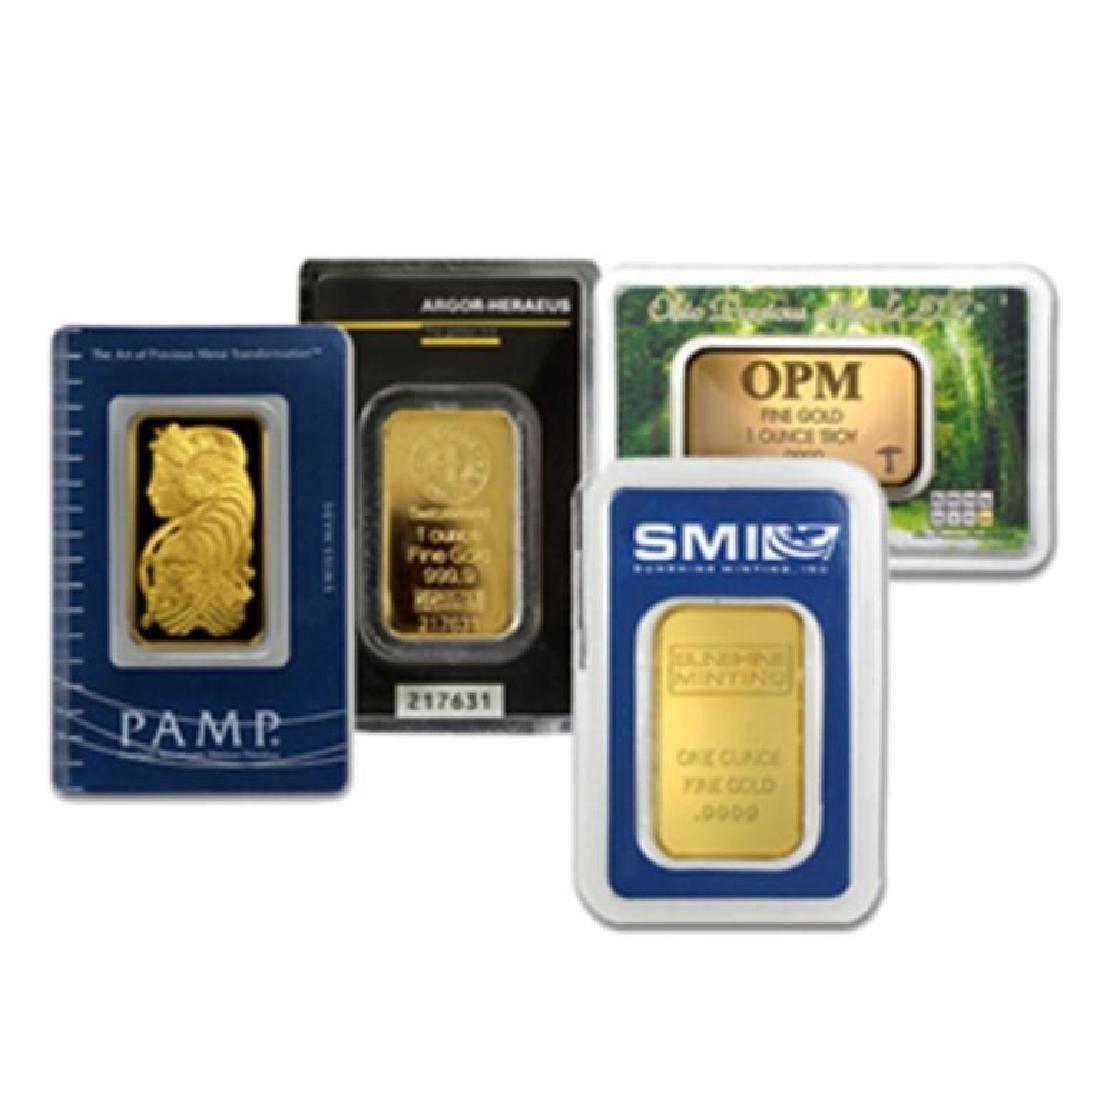 (1) 1 oz. Pure Gold Bullion Bar various maker